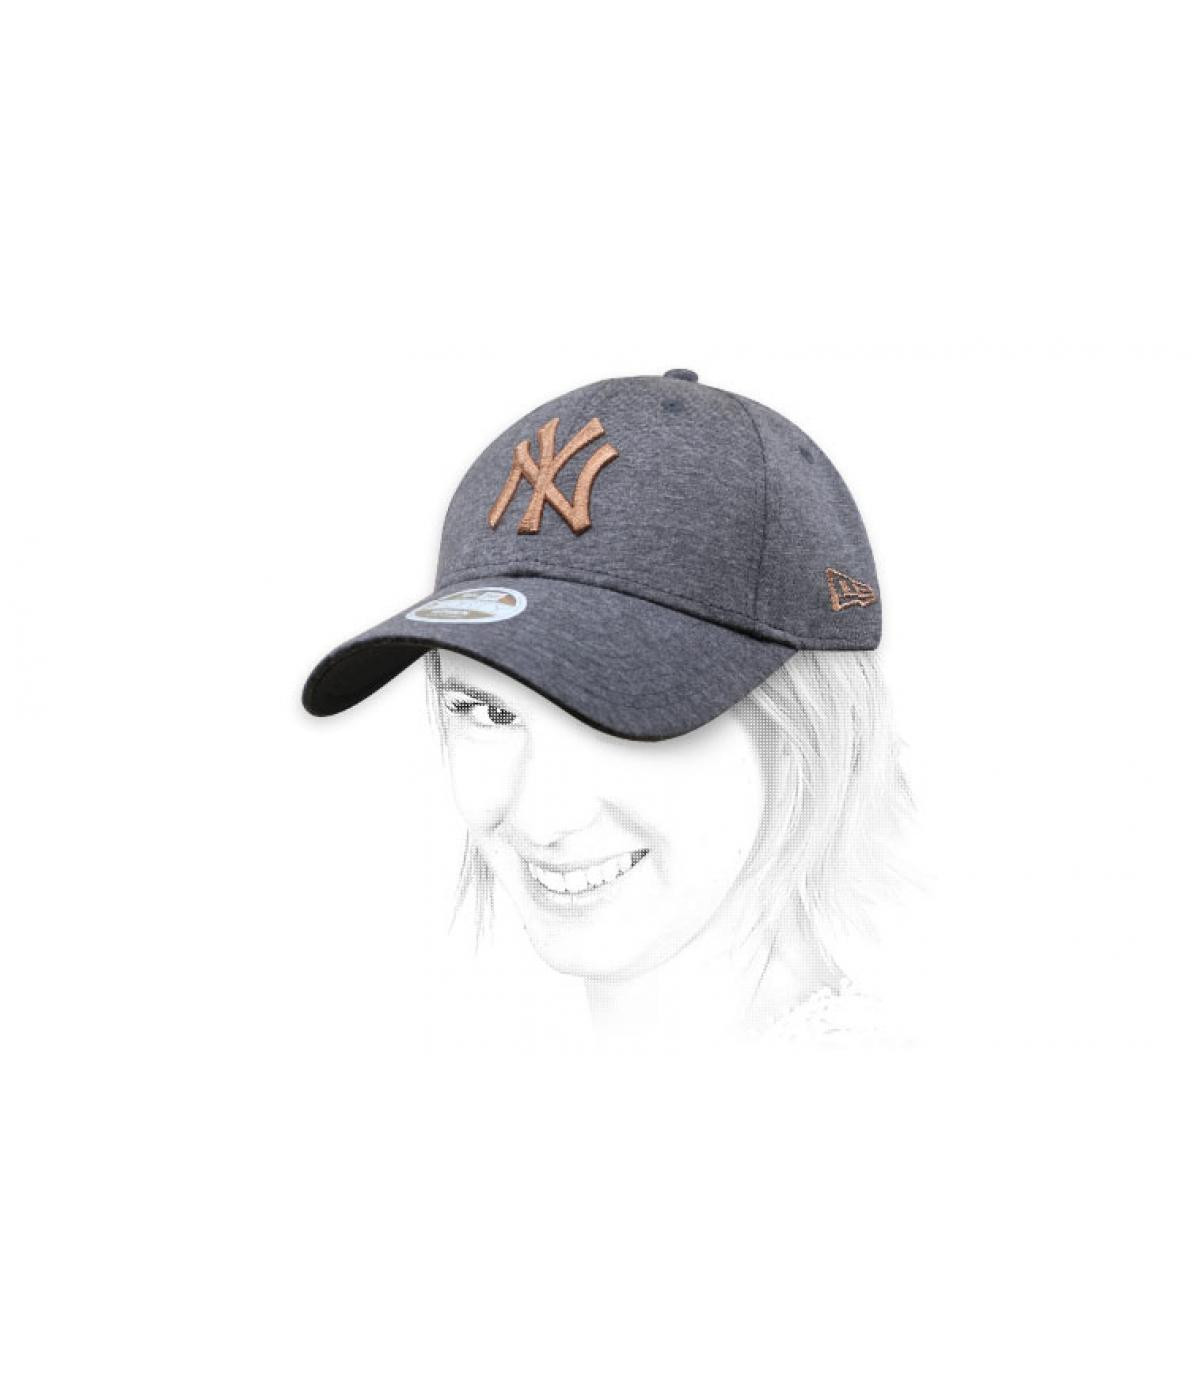 Cappellino NY grigio oro